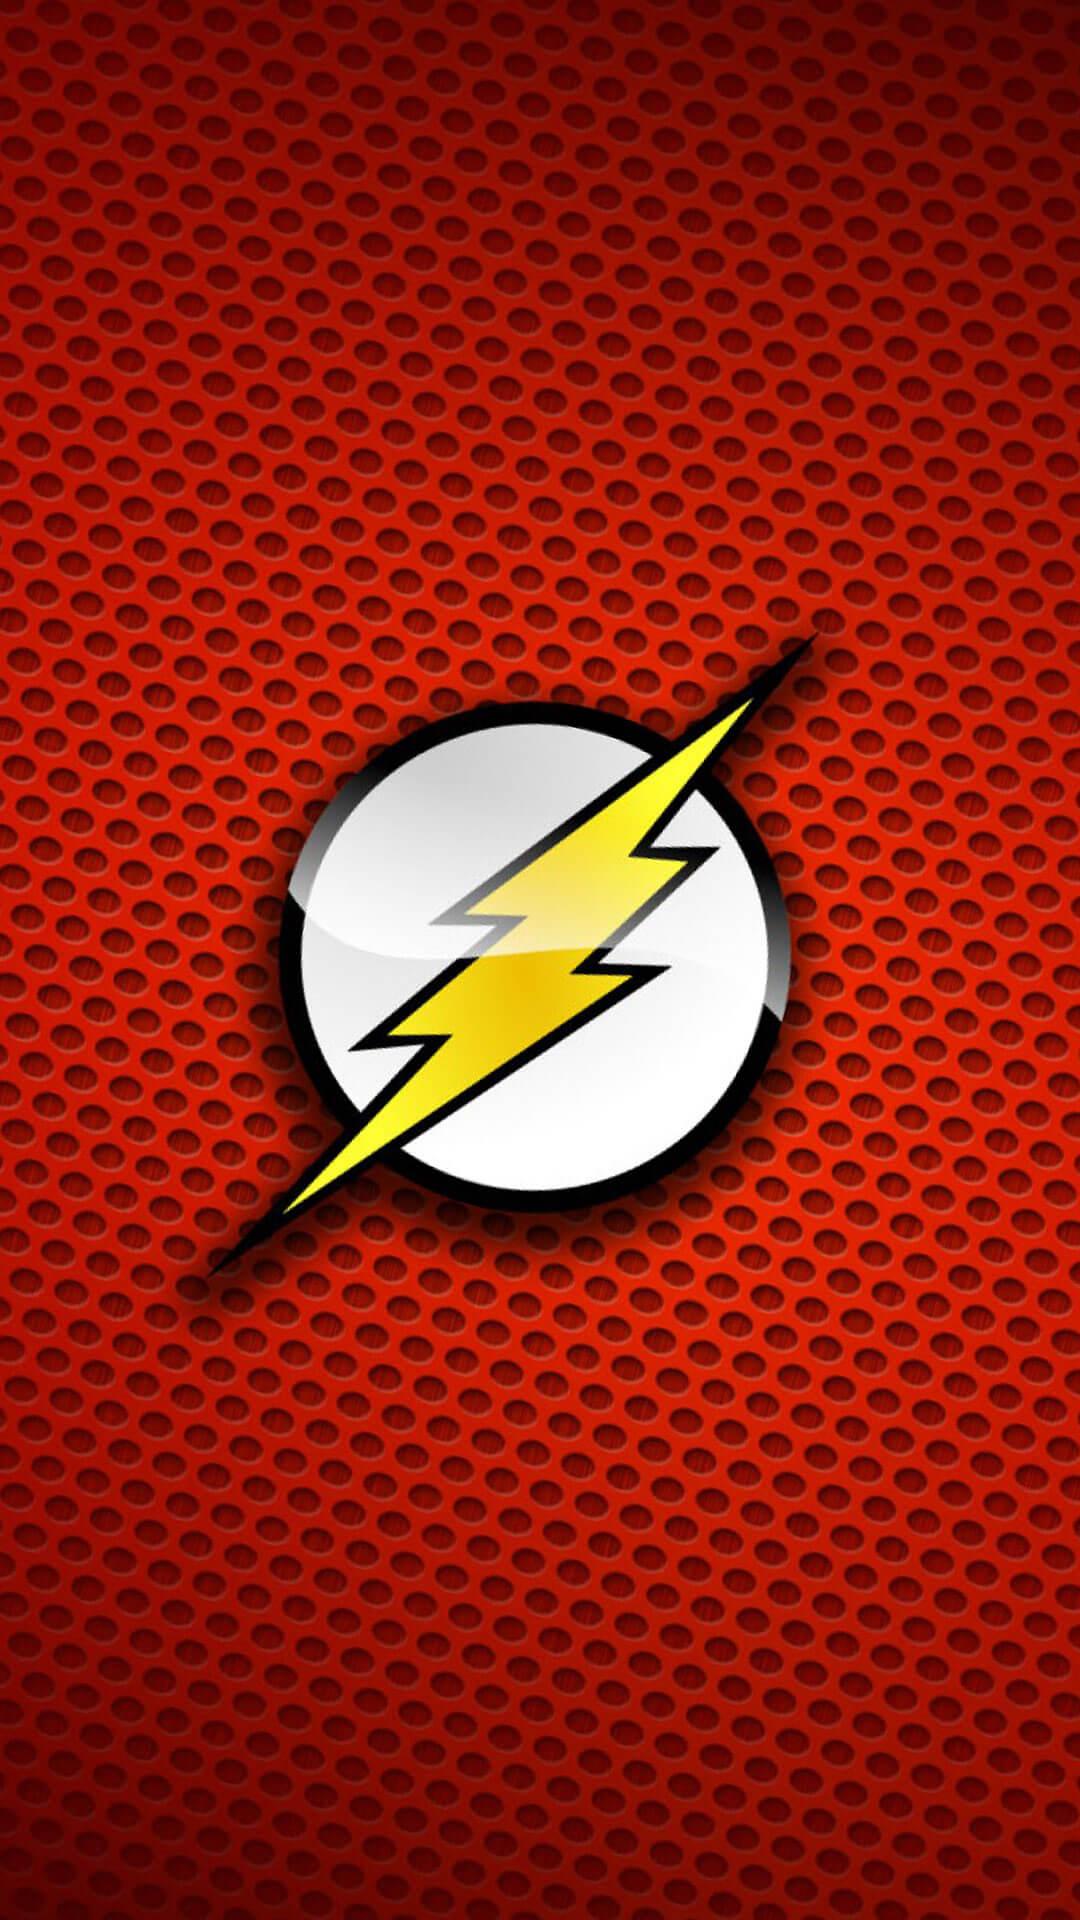 The Flash Logo iPhone 6 Wallpaper   HD Wallpaper iPhone 1080x1920